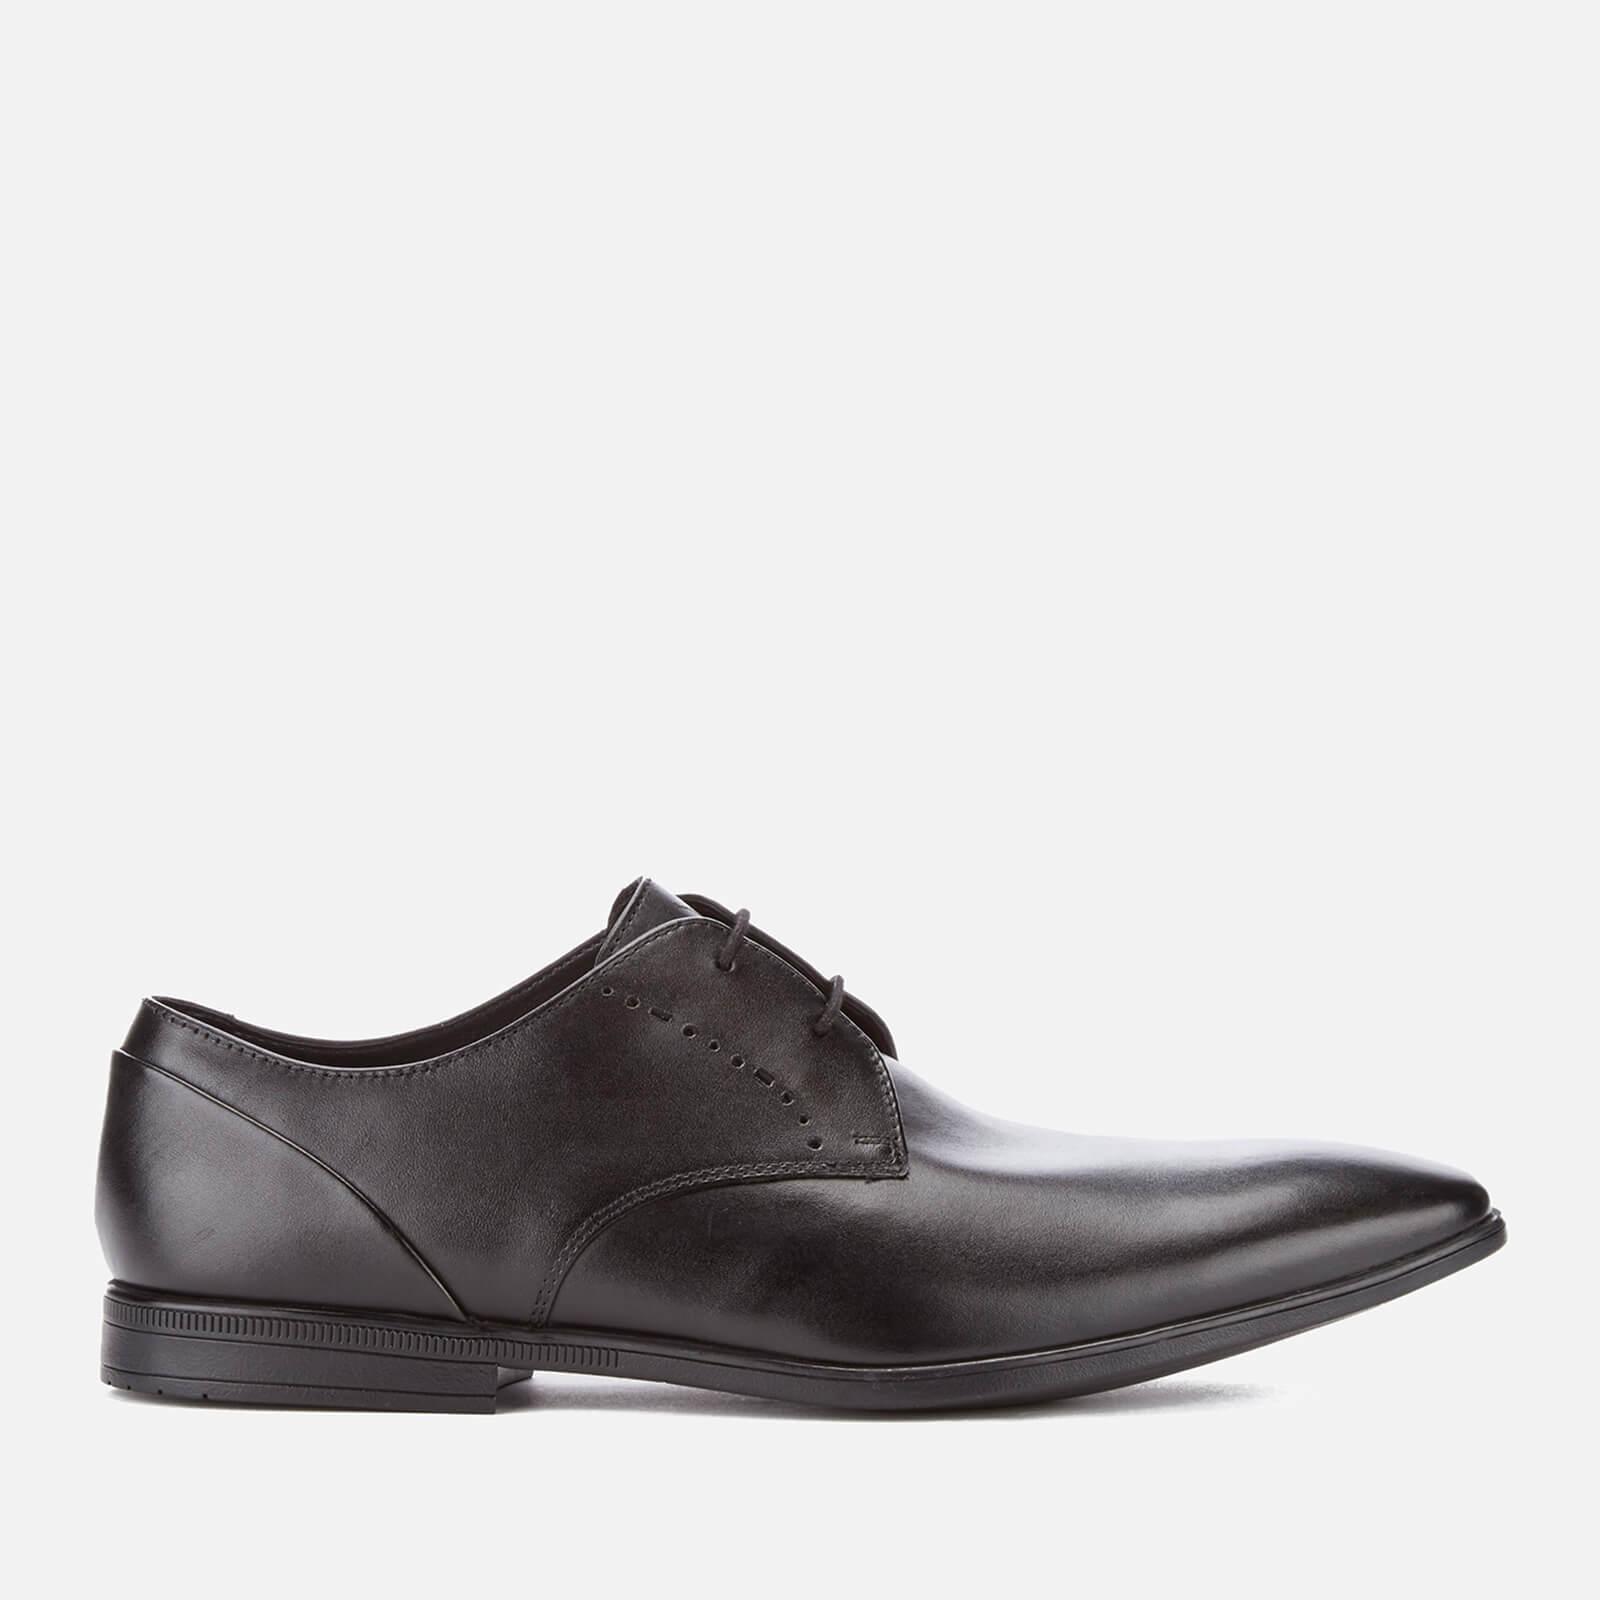 Clarks Men's Bampton Lace Leather Derby Shoes - Black - UK 7